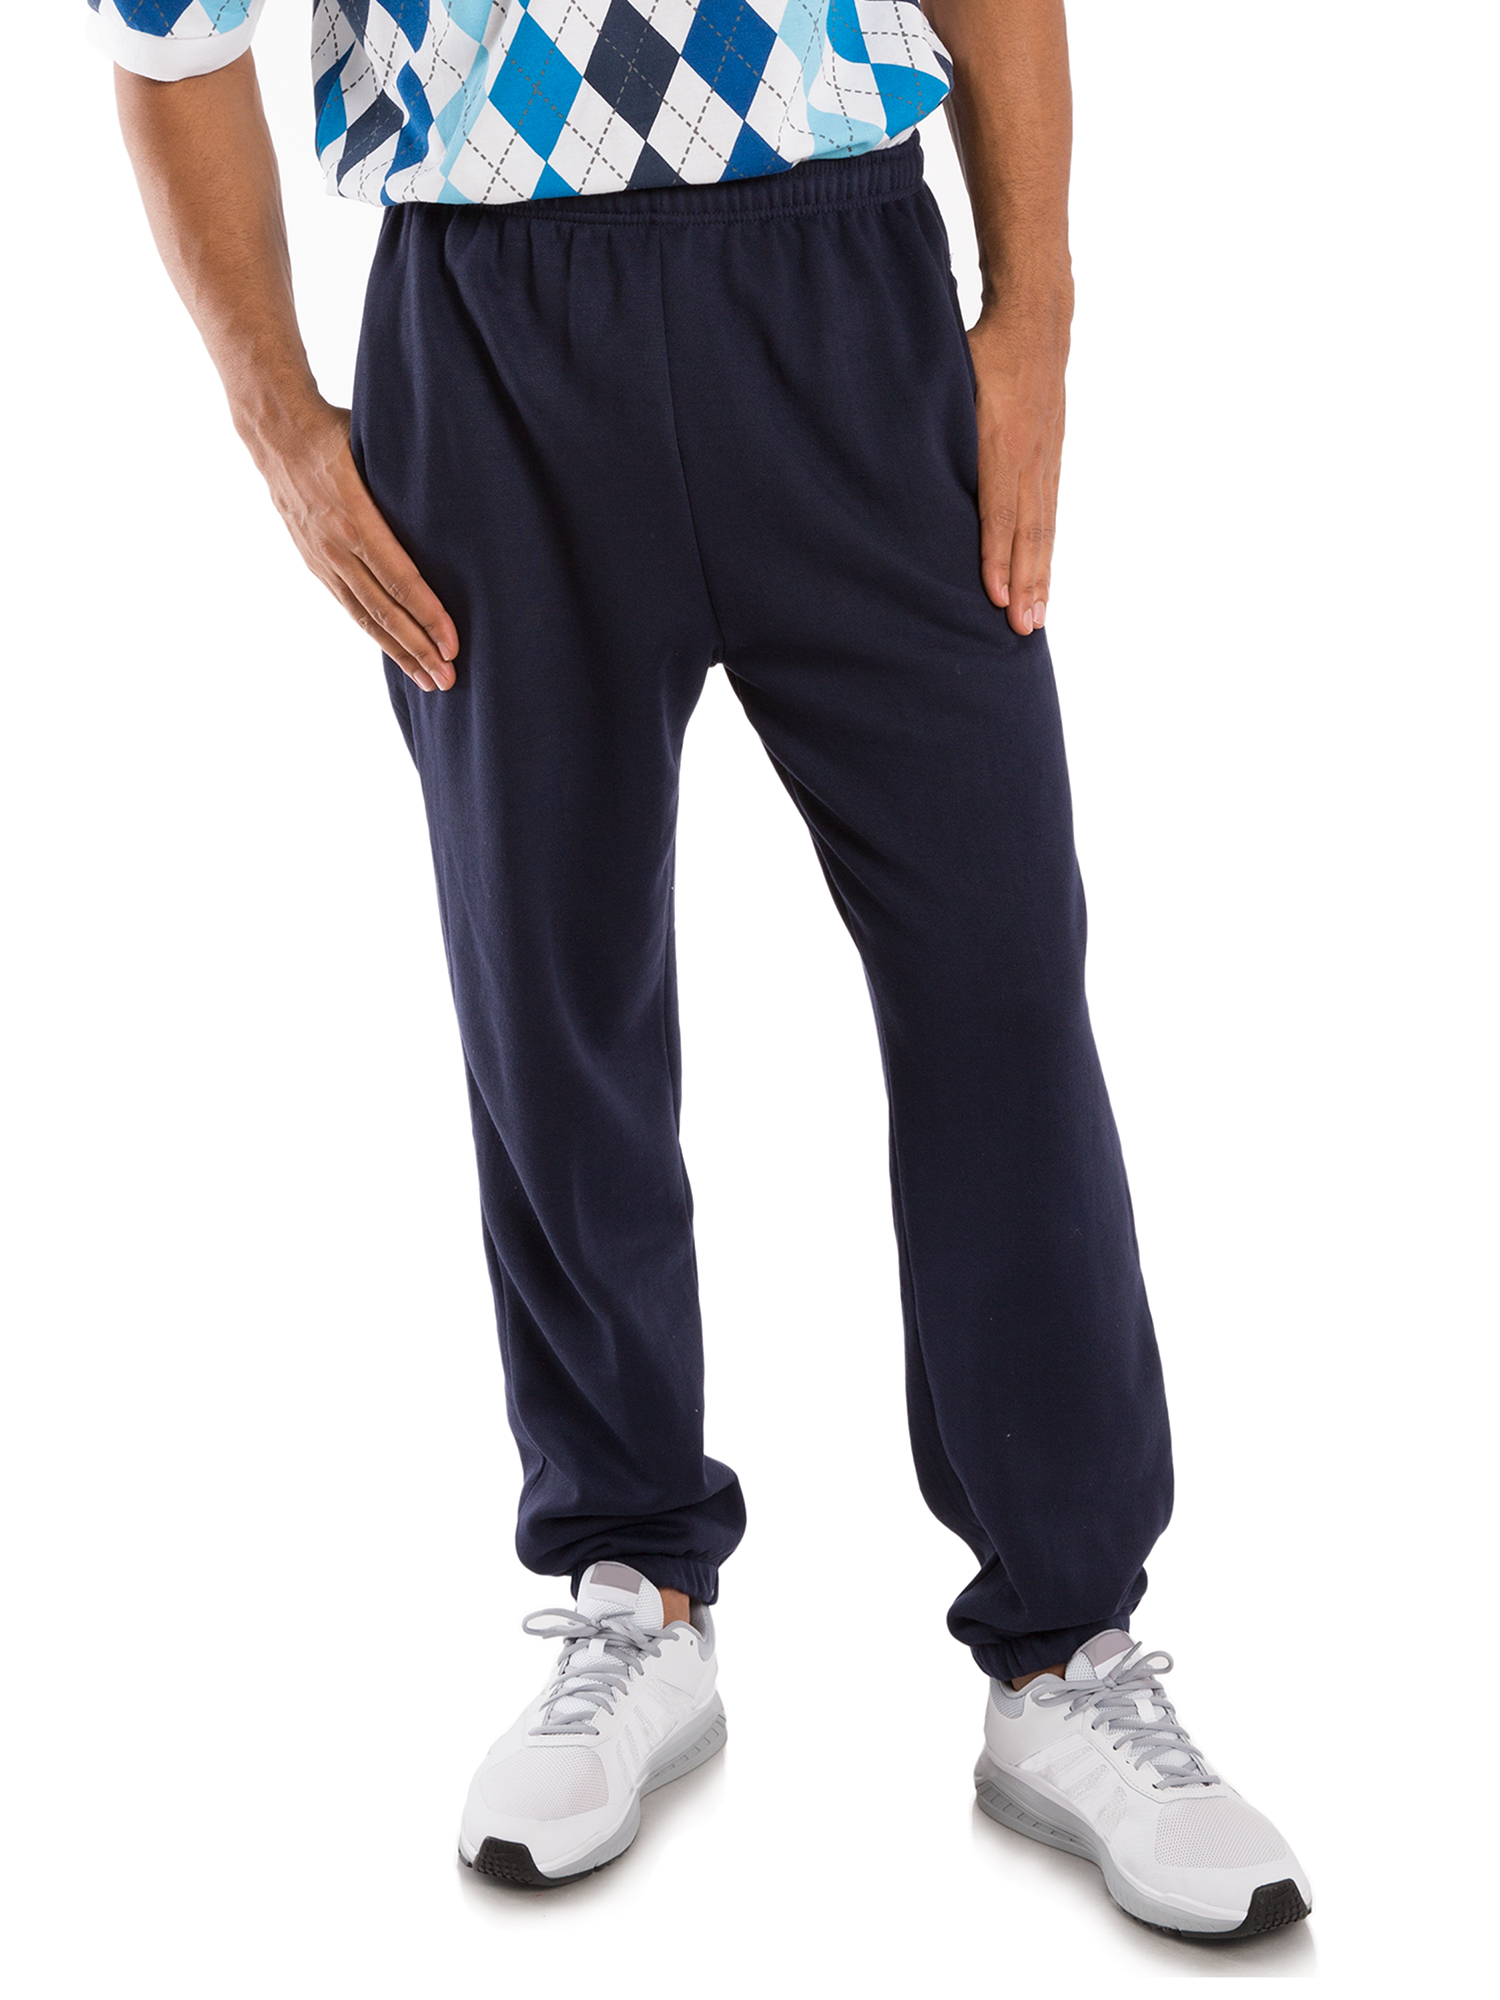 Vibes Men's Navy Fleece Active Jogger Pants Elastic Waistband Bottom